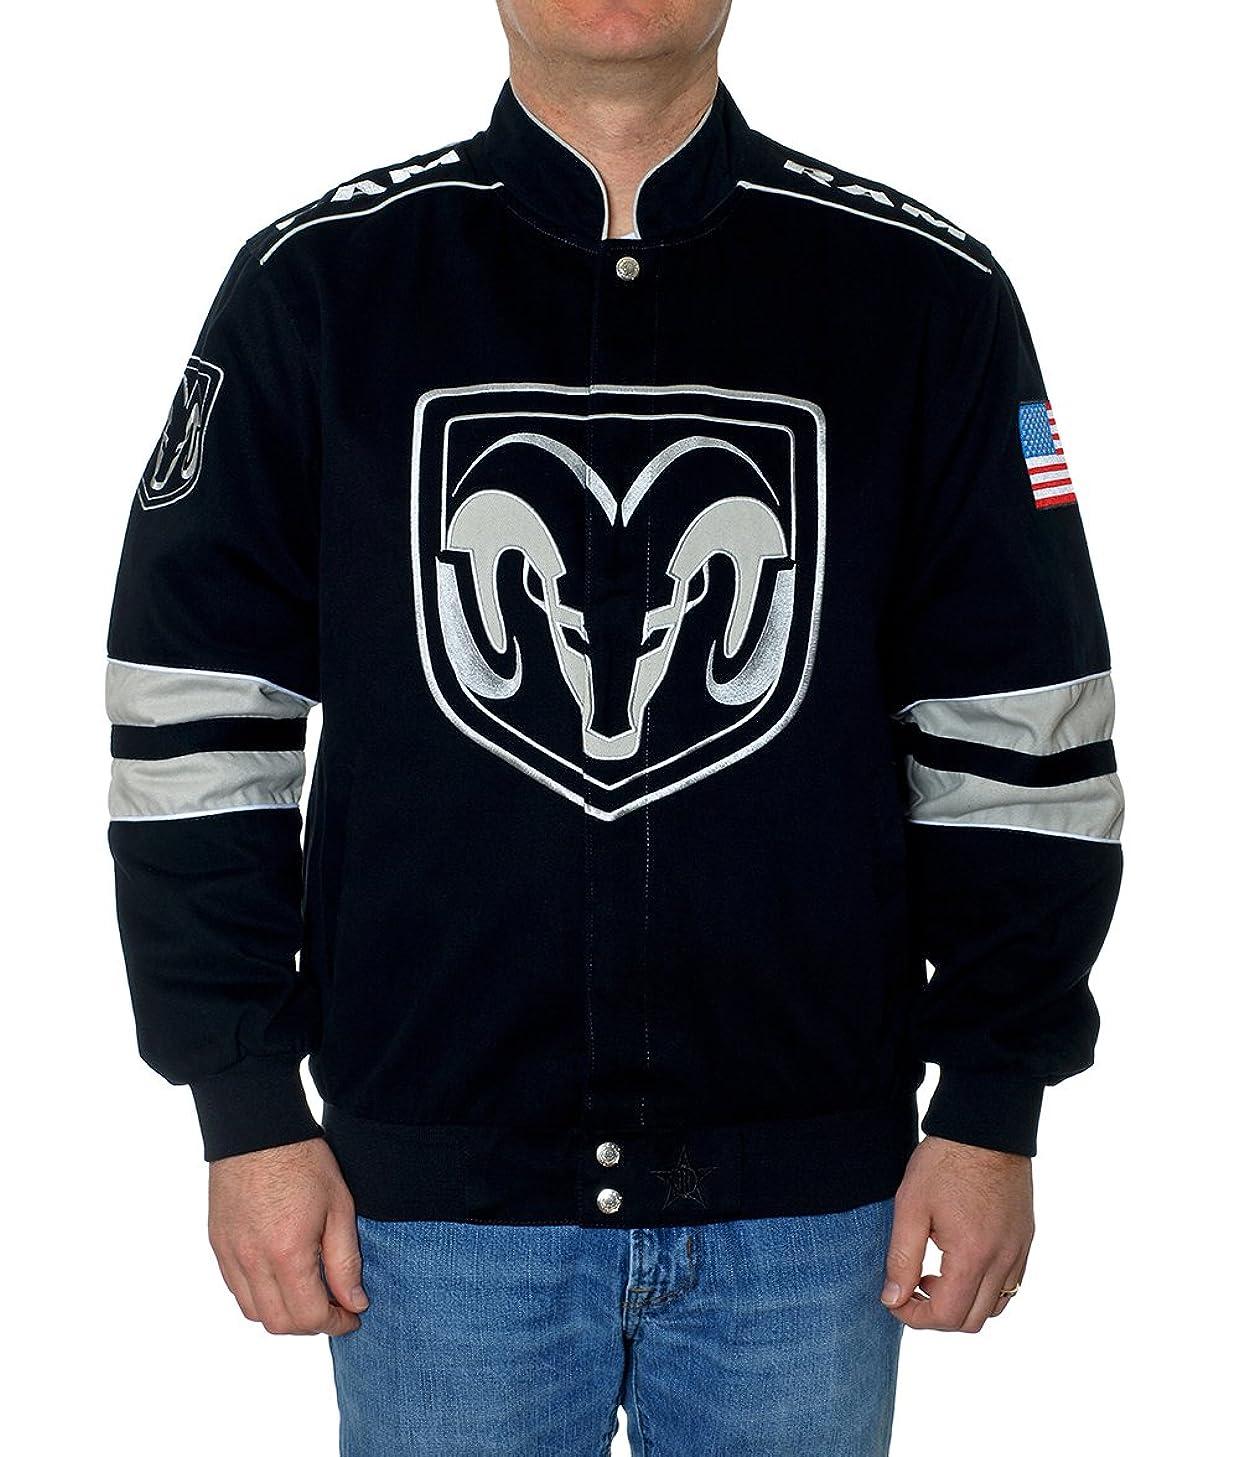 JH Design Men's Dodge Ram Truck Jacket an Embroidered Cotton Twill Coat